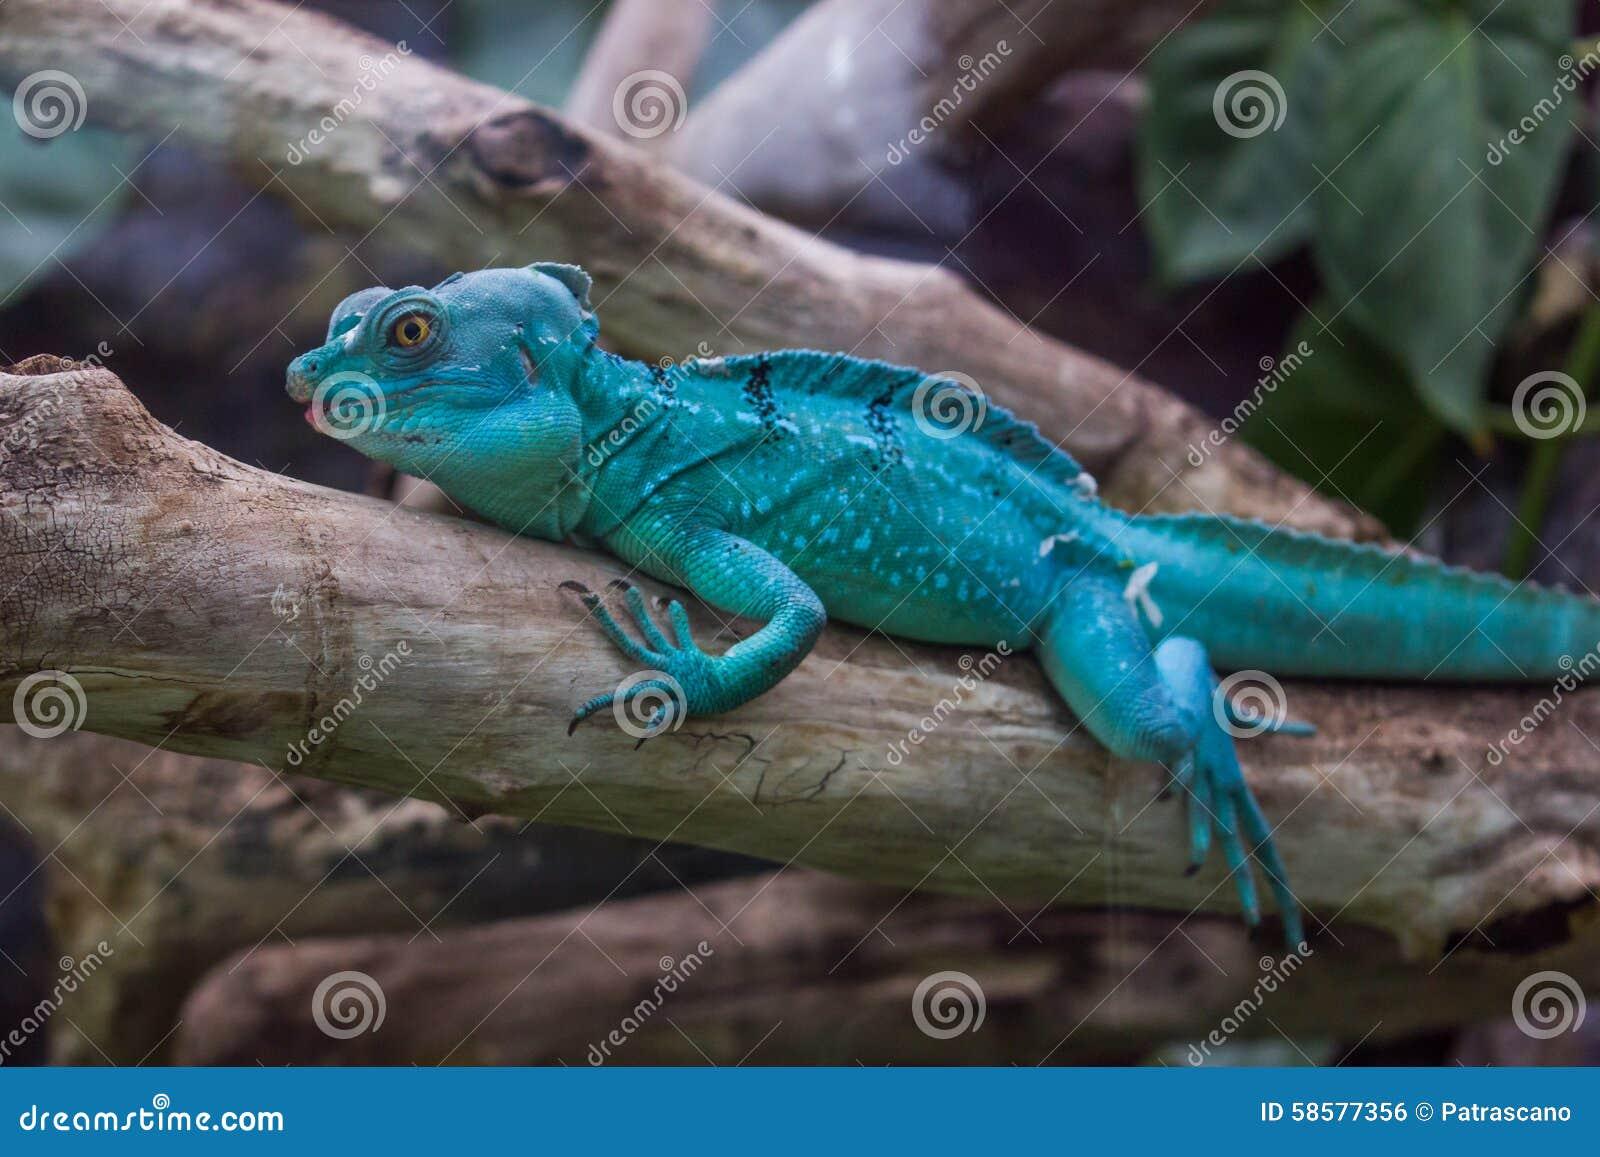 Dragon Bleu Animal blue dragon like lizzard stock photo. image of monitor - 58577356